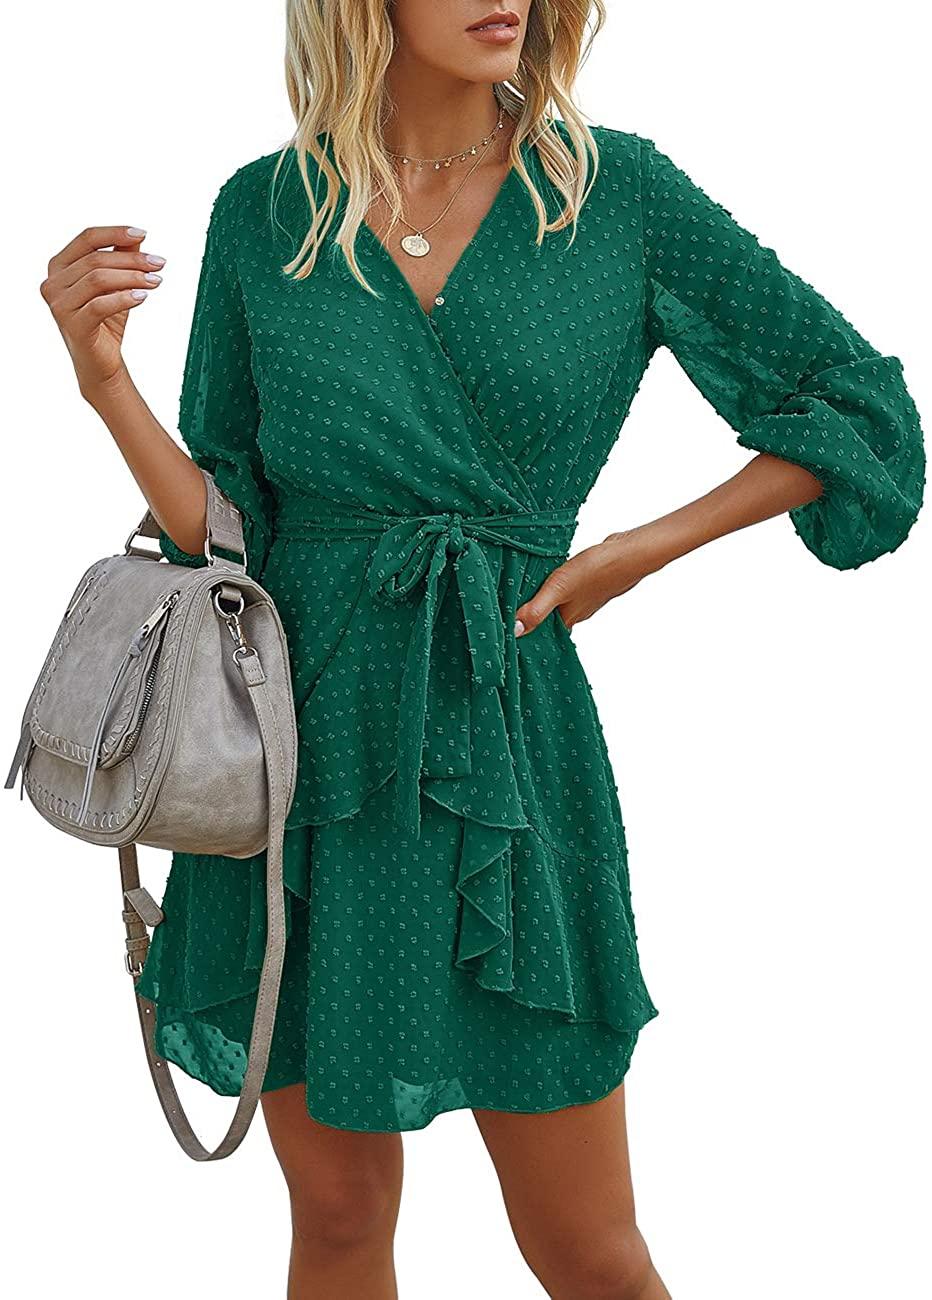 Saslax Womens Casual Faux Wrap V-Neck Short Sleeves Elastic Waist Hem Party Beach Short Dress with Belt